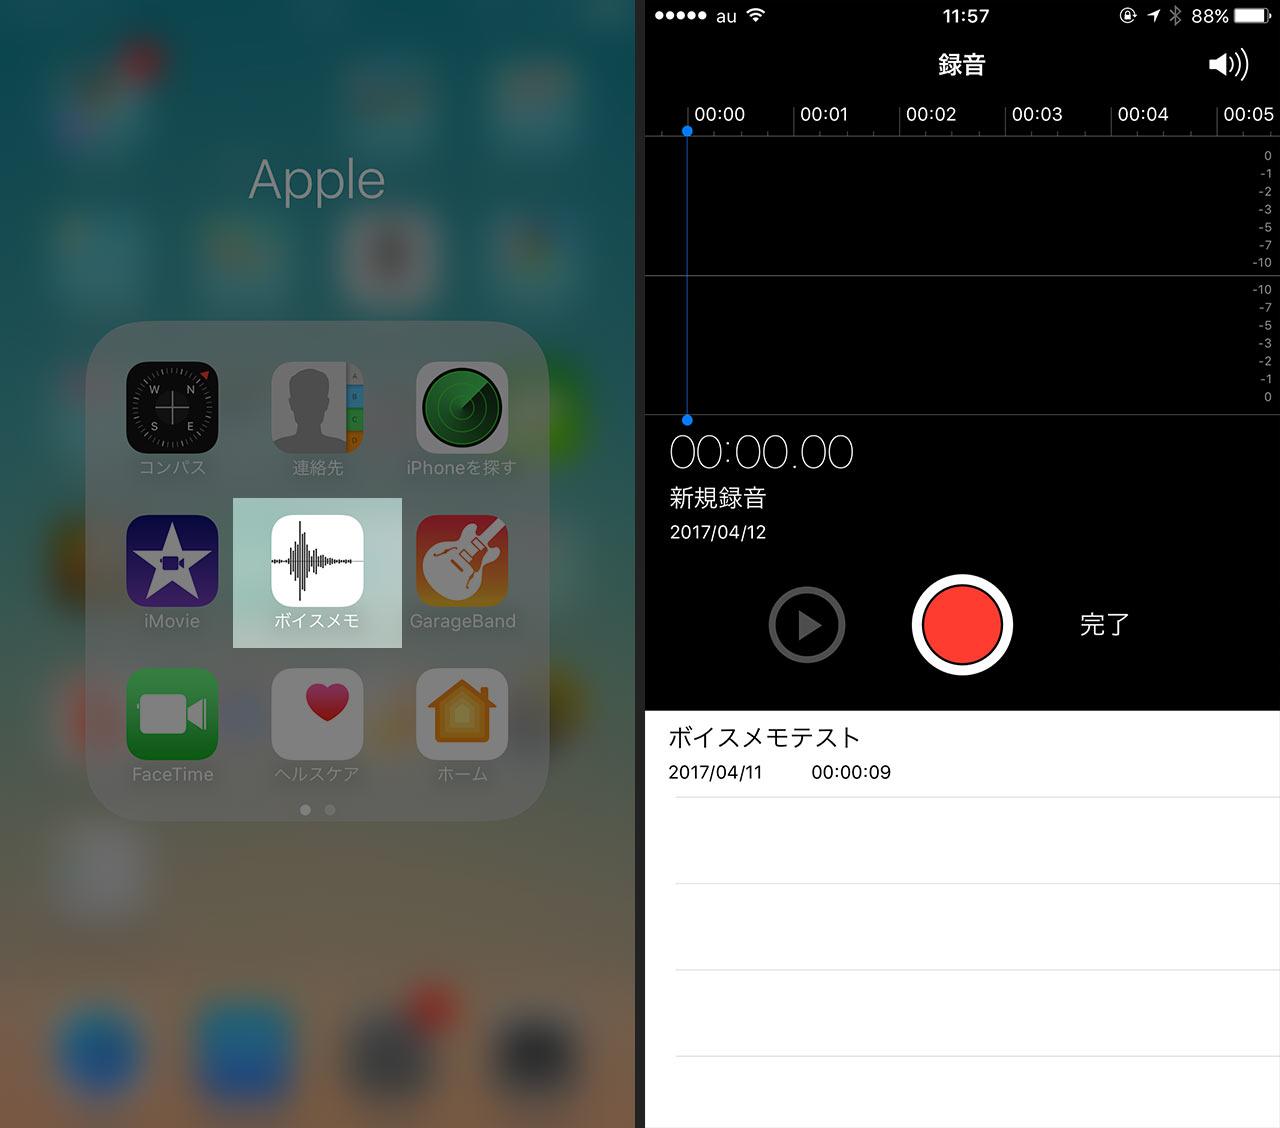 iPhoneのボイスメモアプリ